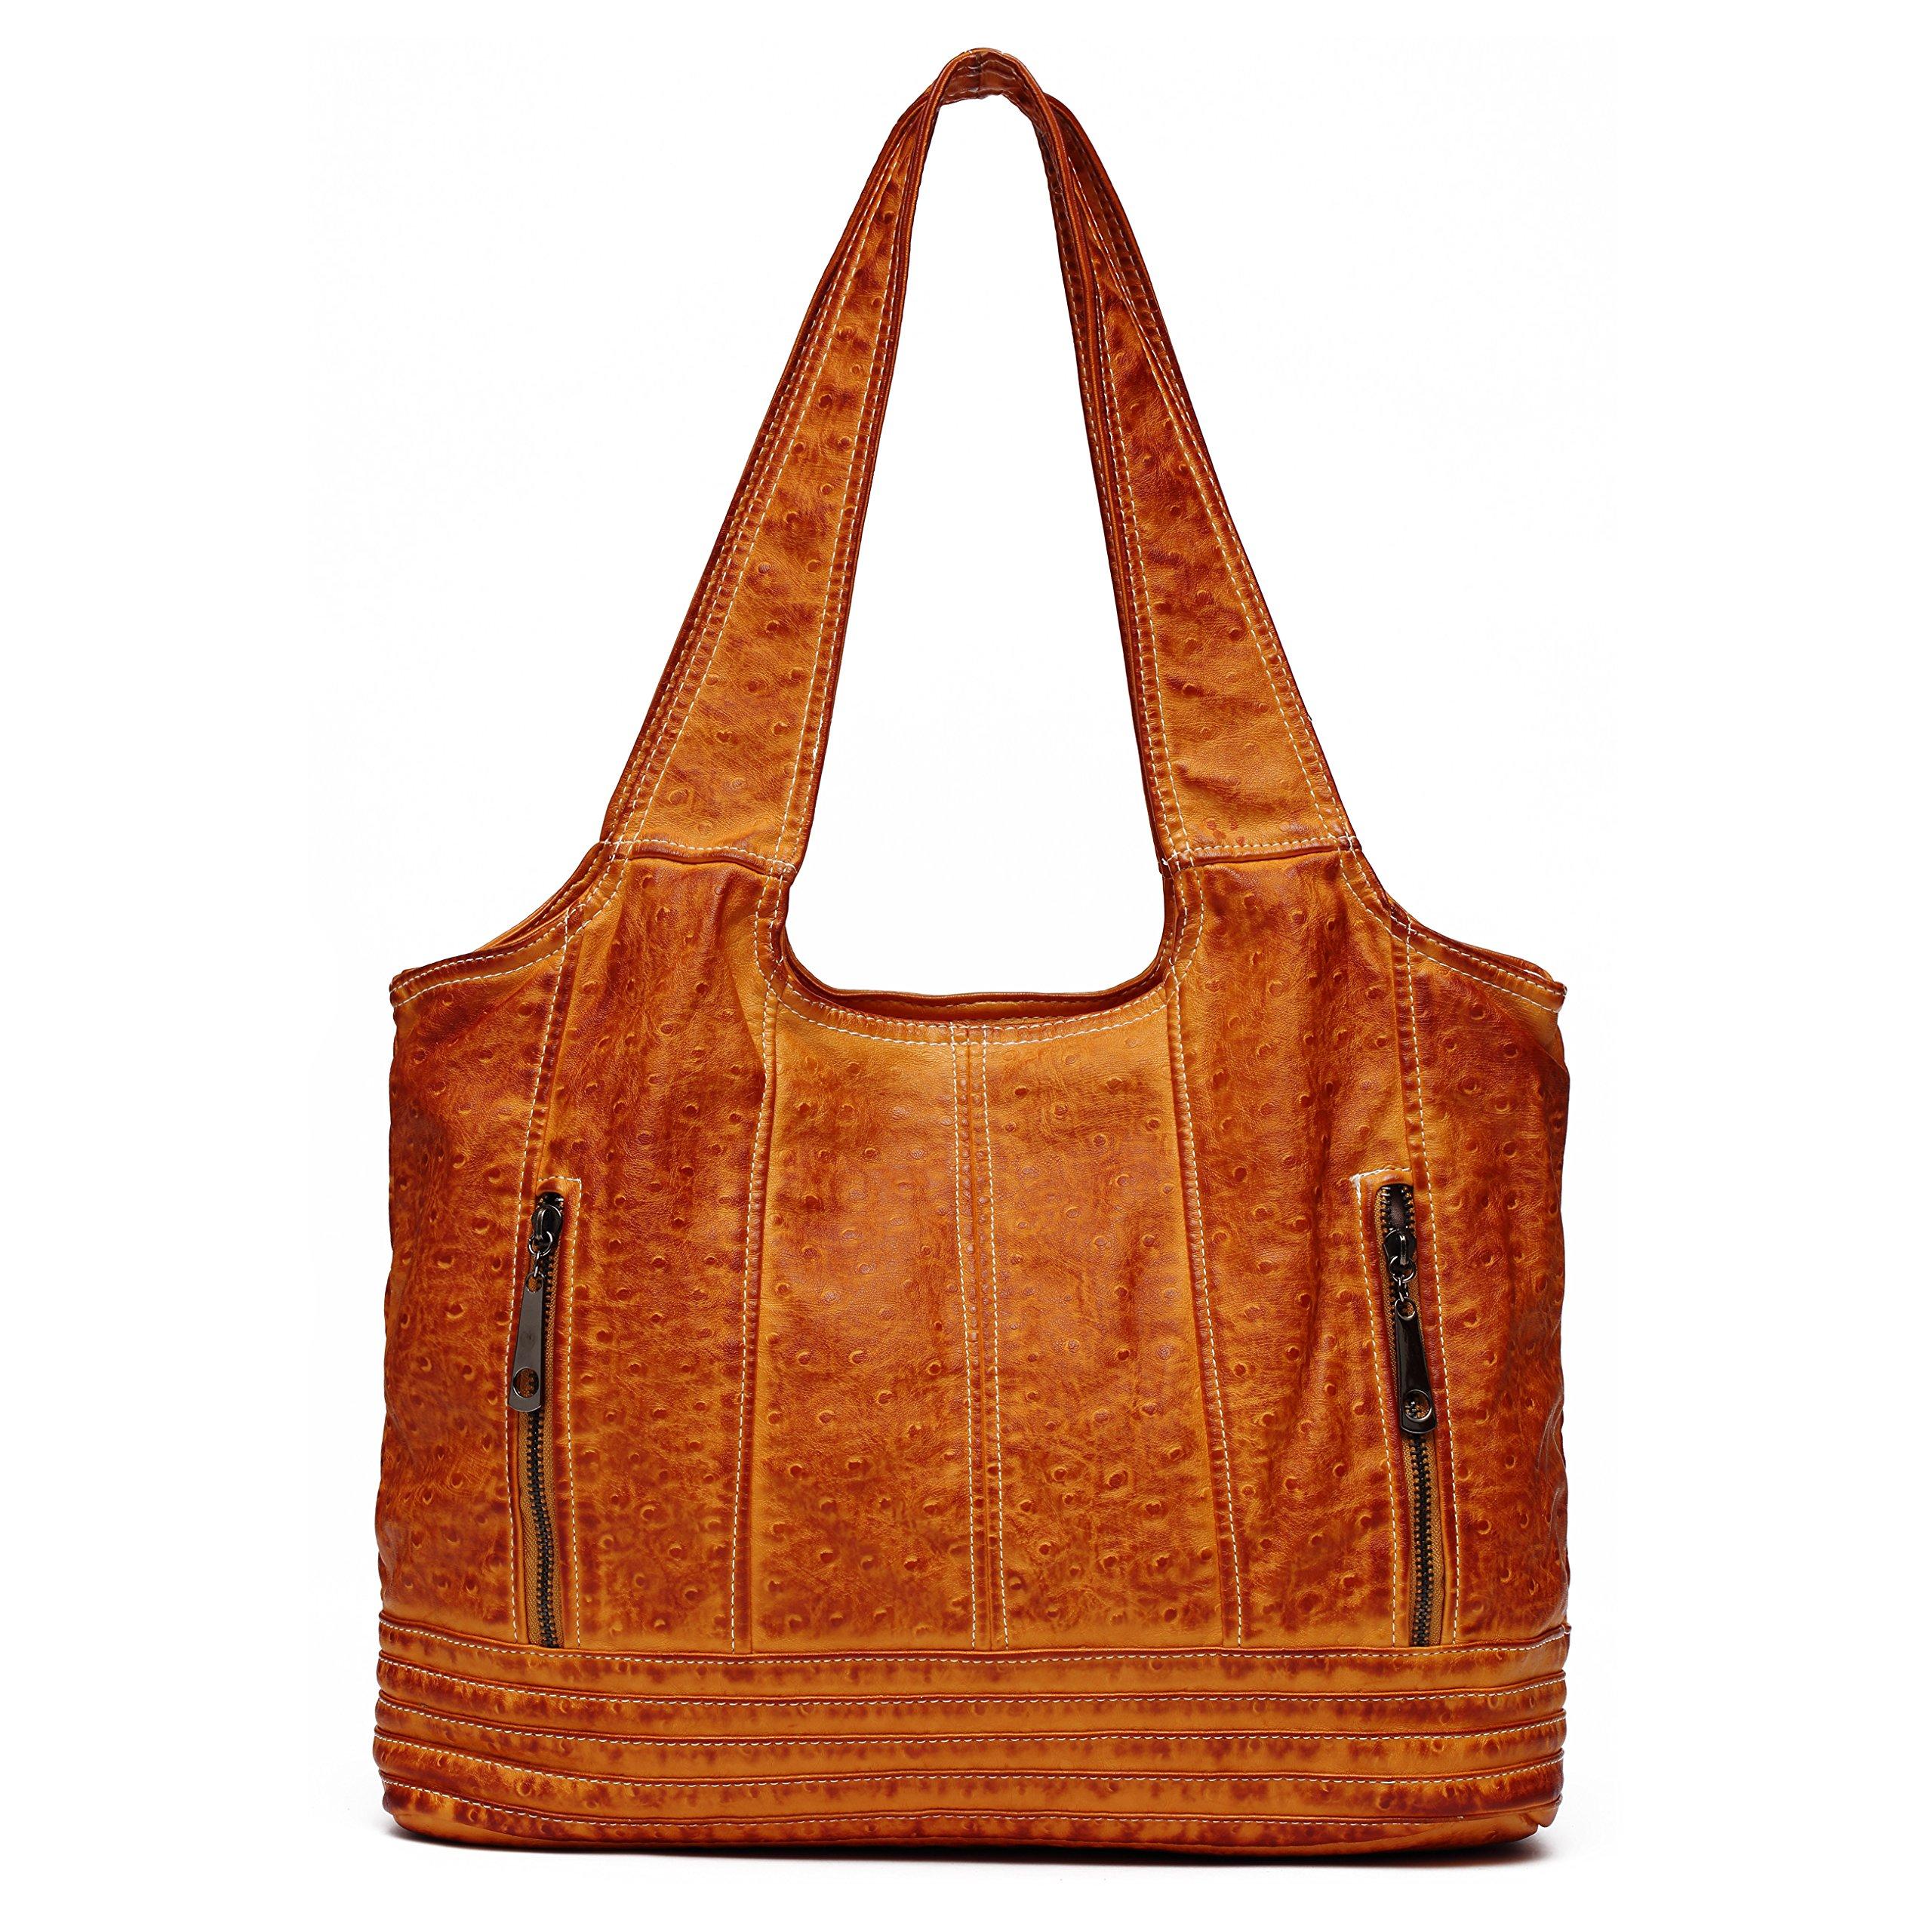 Ali Victory Large Women Hobo Shoulder Bags PU Leather Handbags Fashion Tote (Brown)